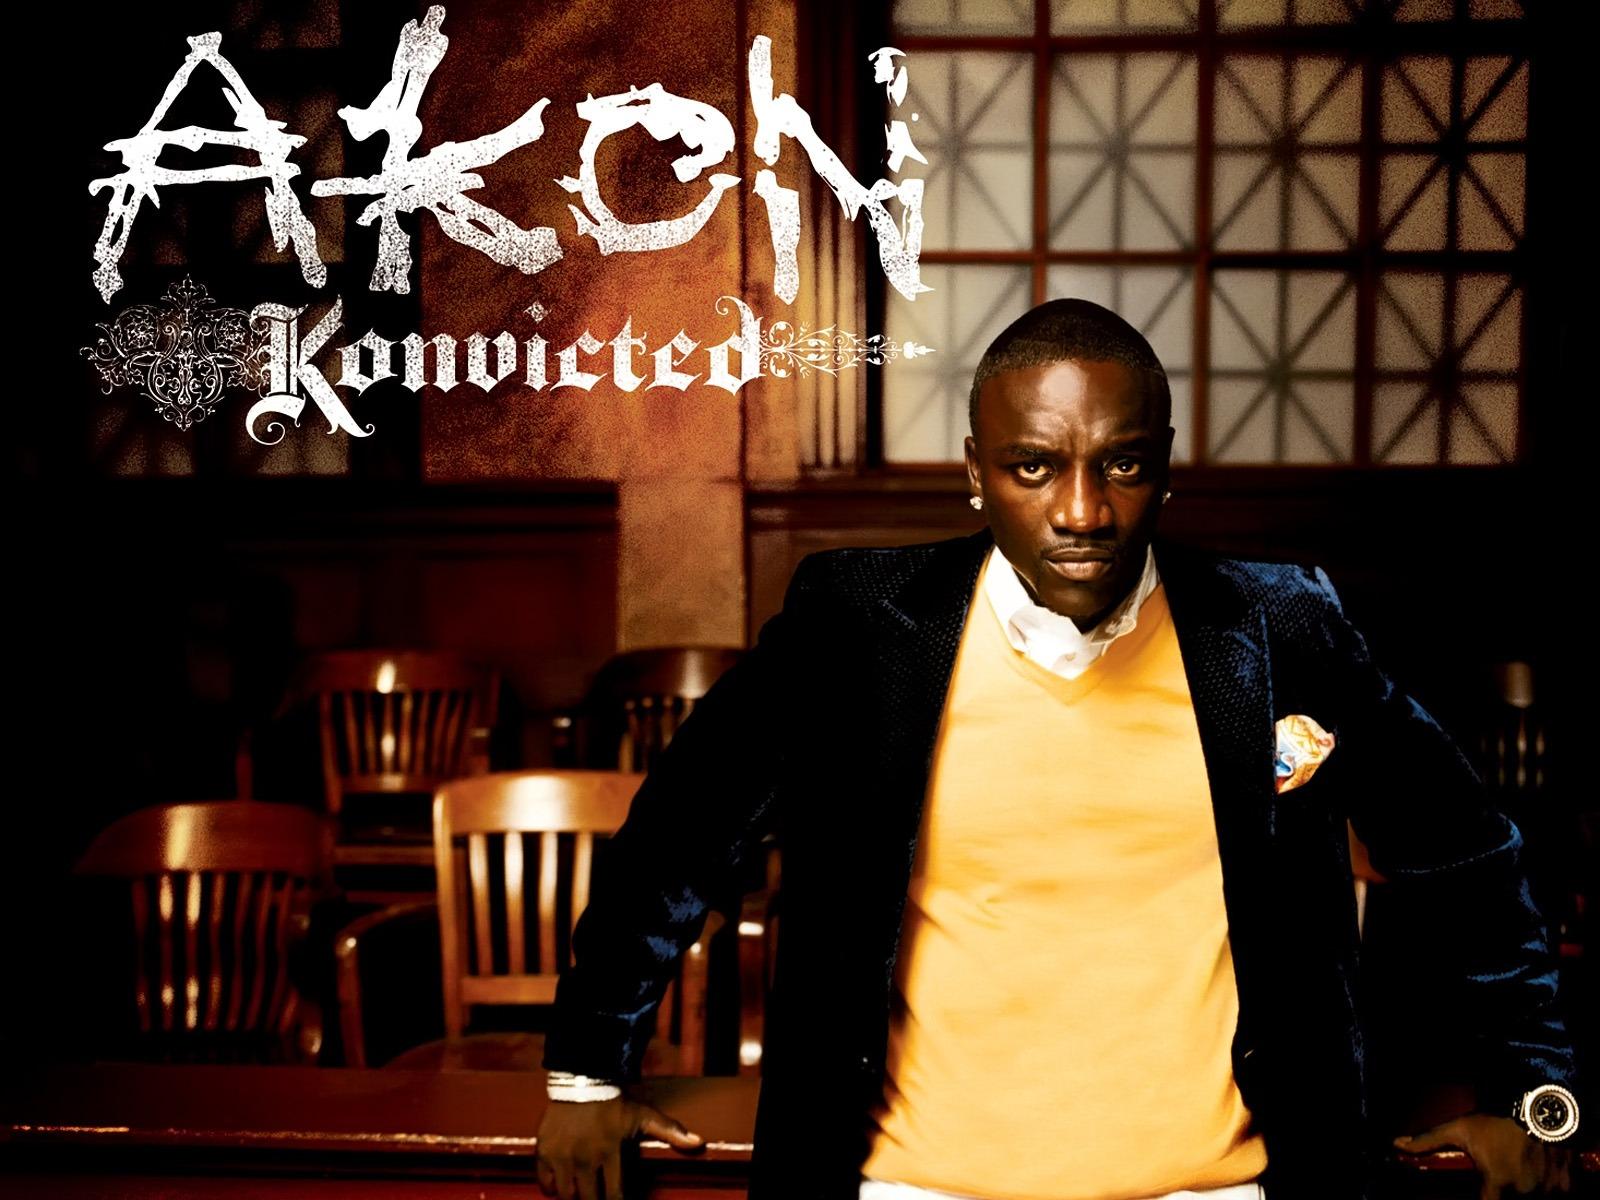 Akon Wallpaper Akon Male celebrities Wallpapers in jpg format for